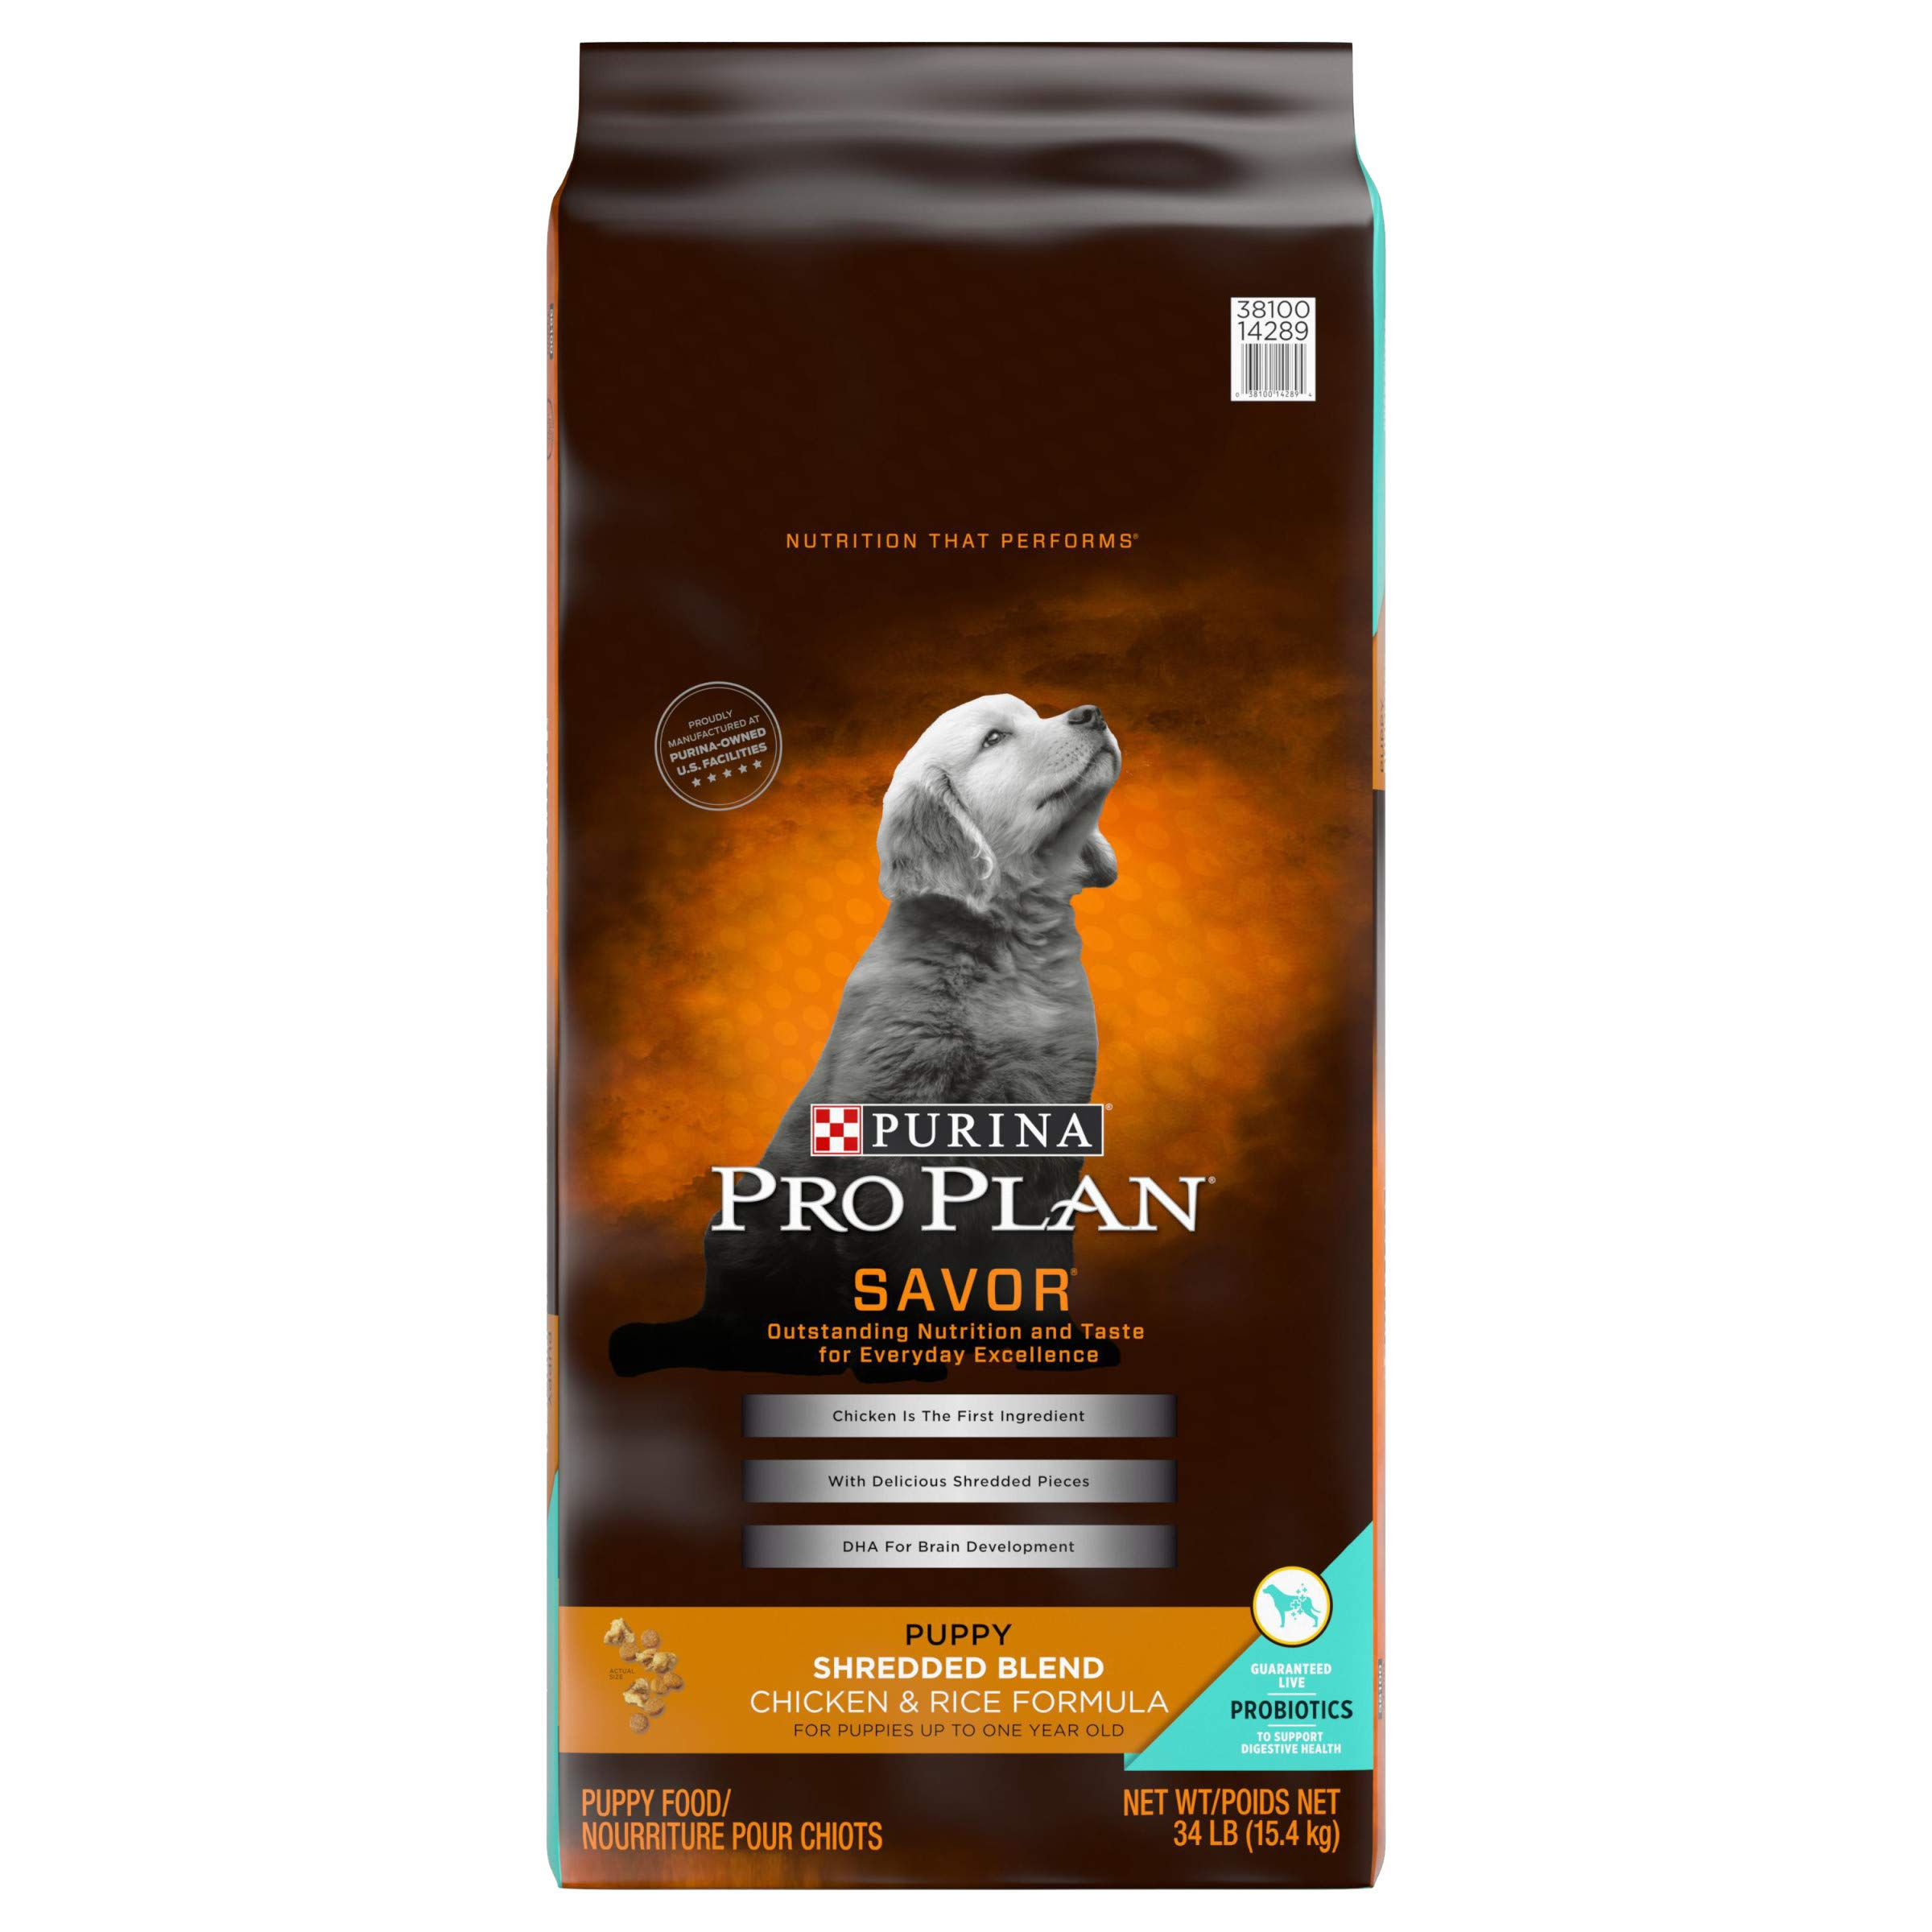 Purina Pro Plan Probiotics Dry Puppy Food, SAVOR Shredded Blend Chicken & Rice Formula - 34 lb. Bag by Purina Pro Plan